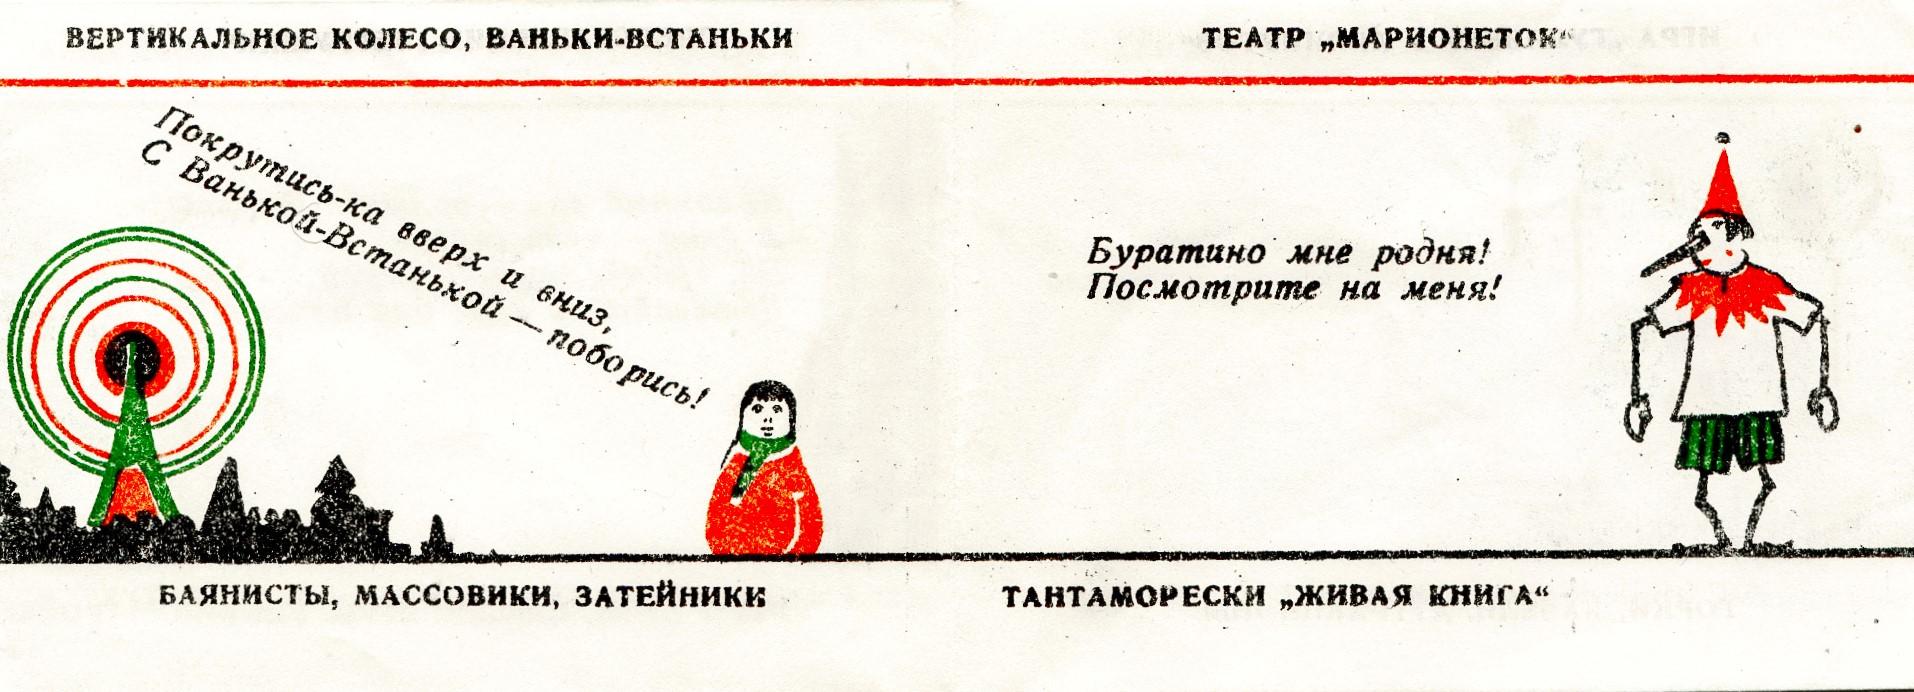 1946 программа005 кор.jpg